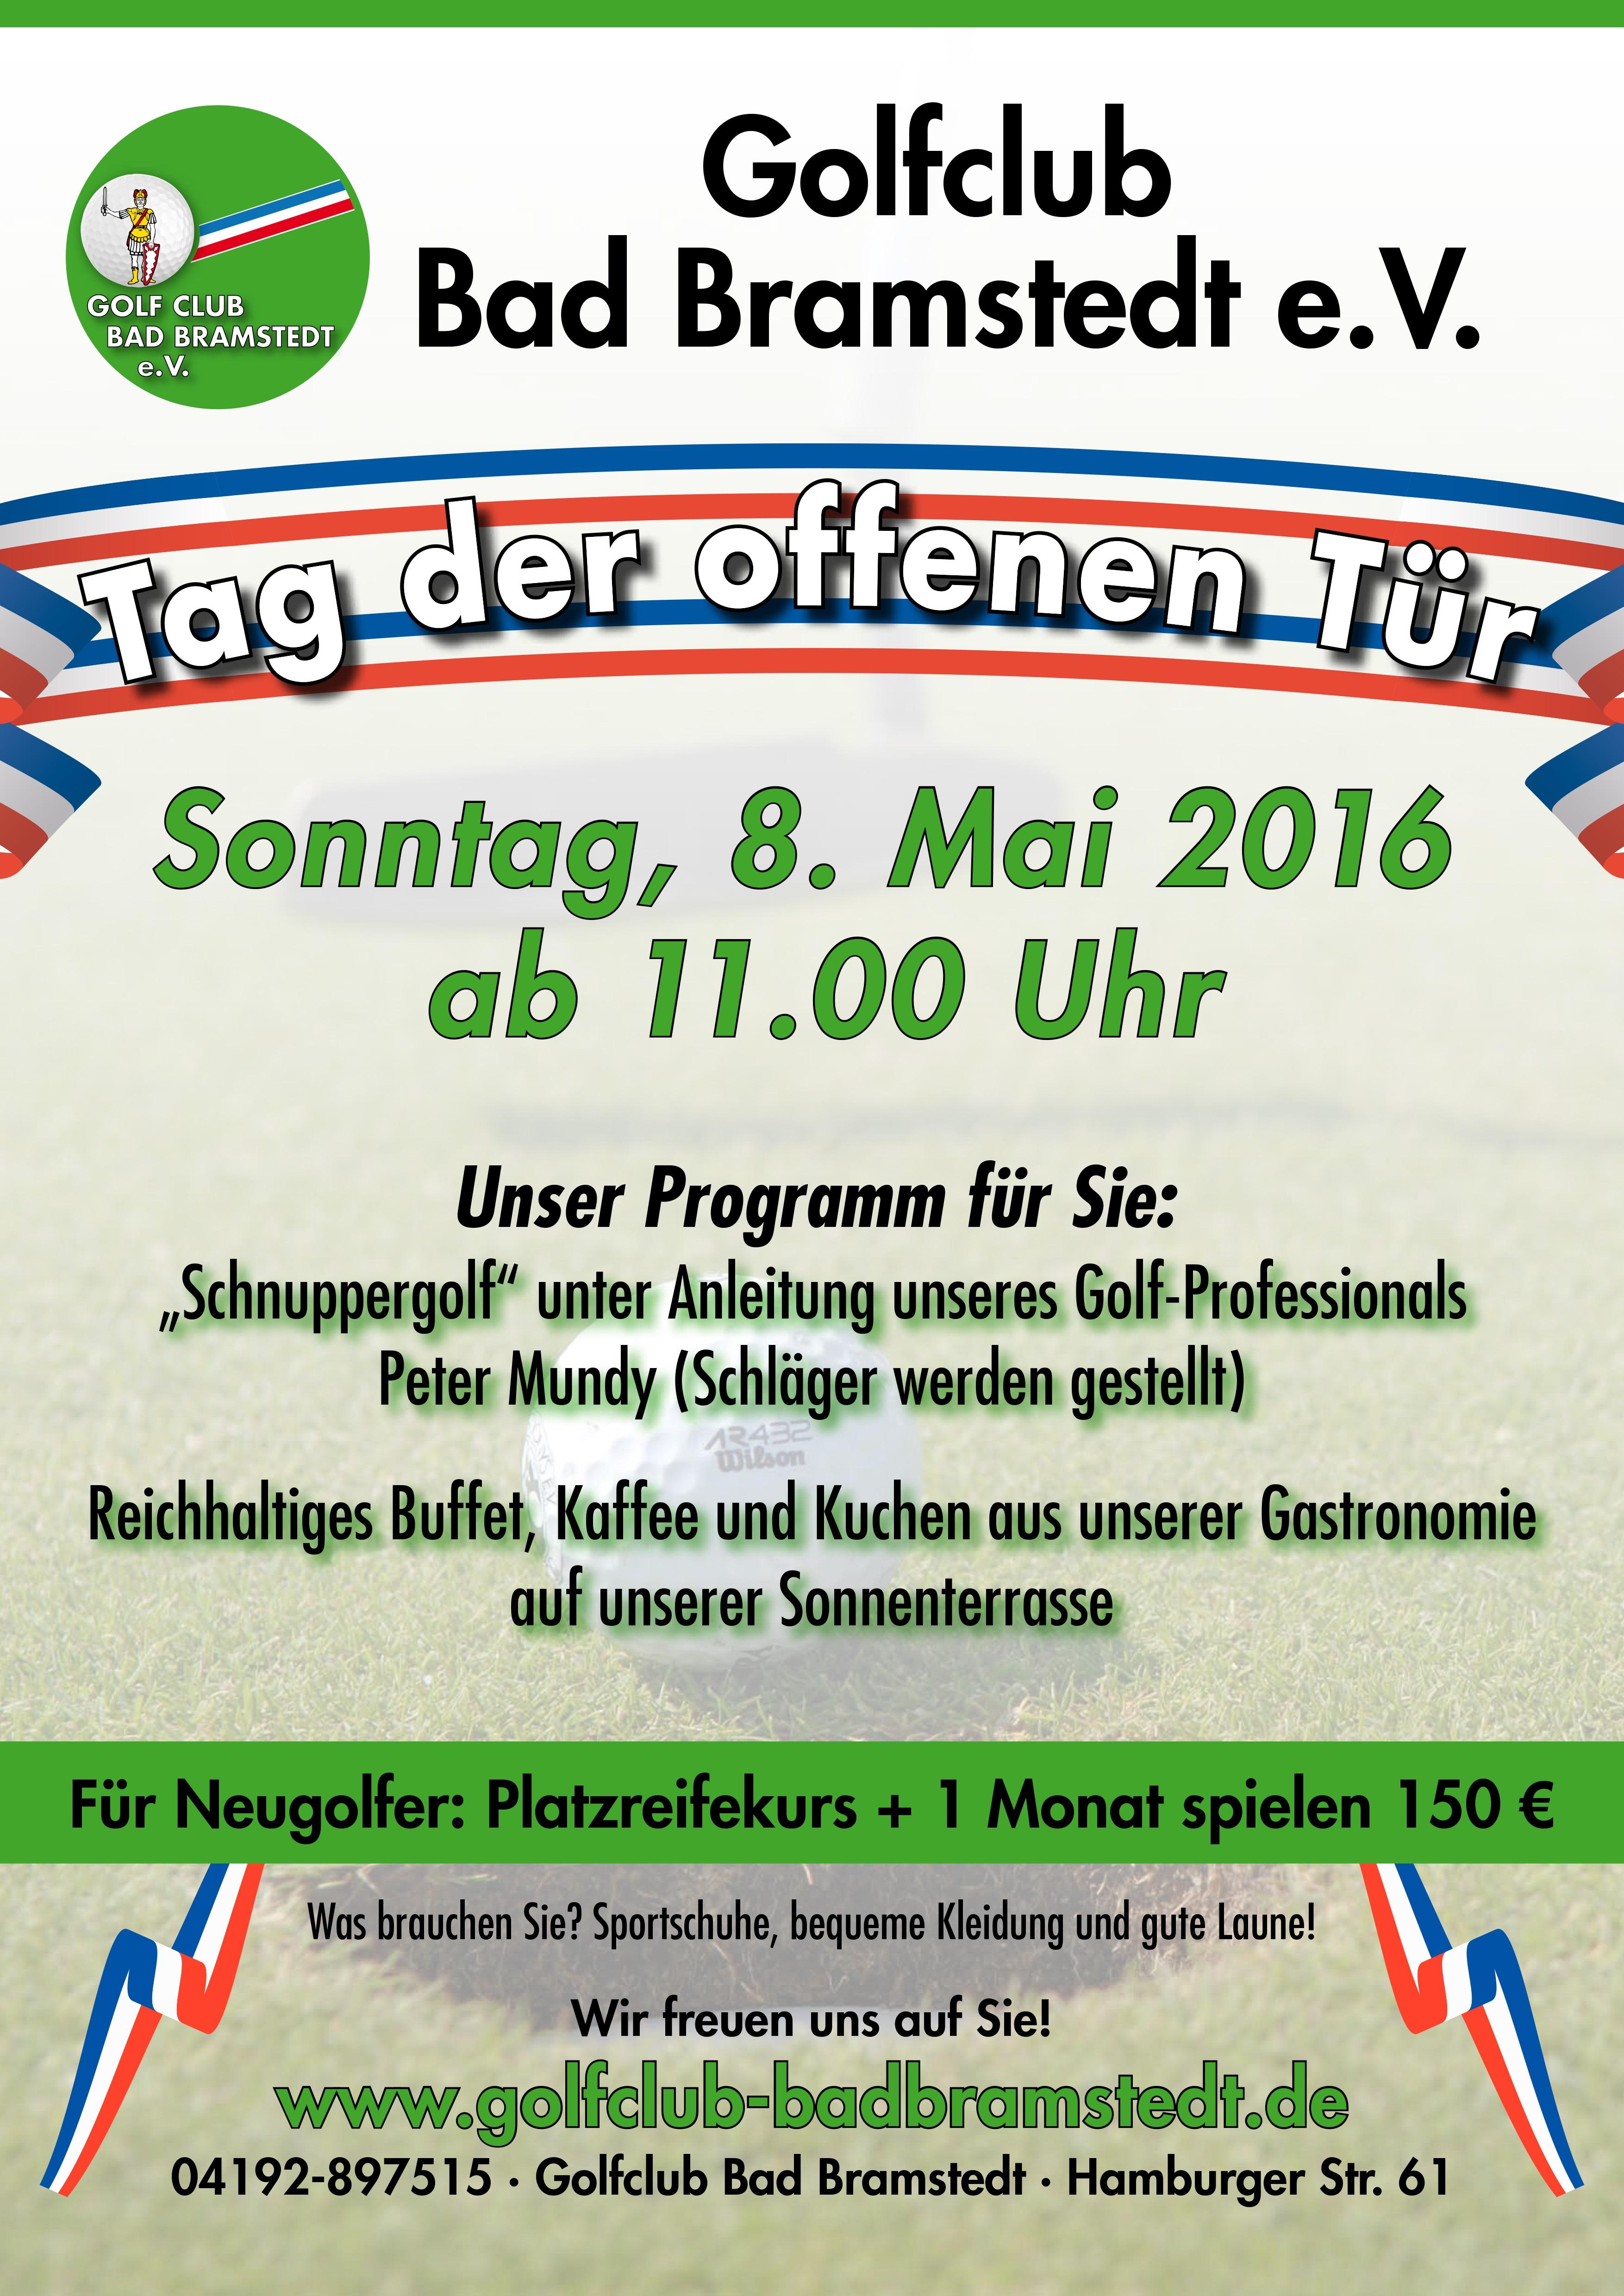 Golfclub Bad Bramstedt 2016